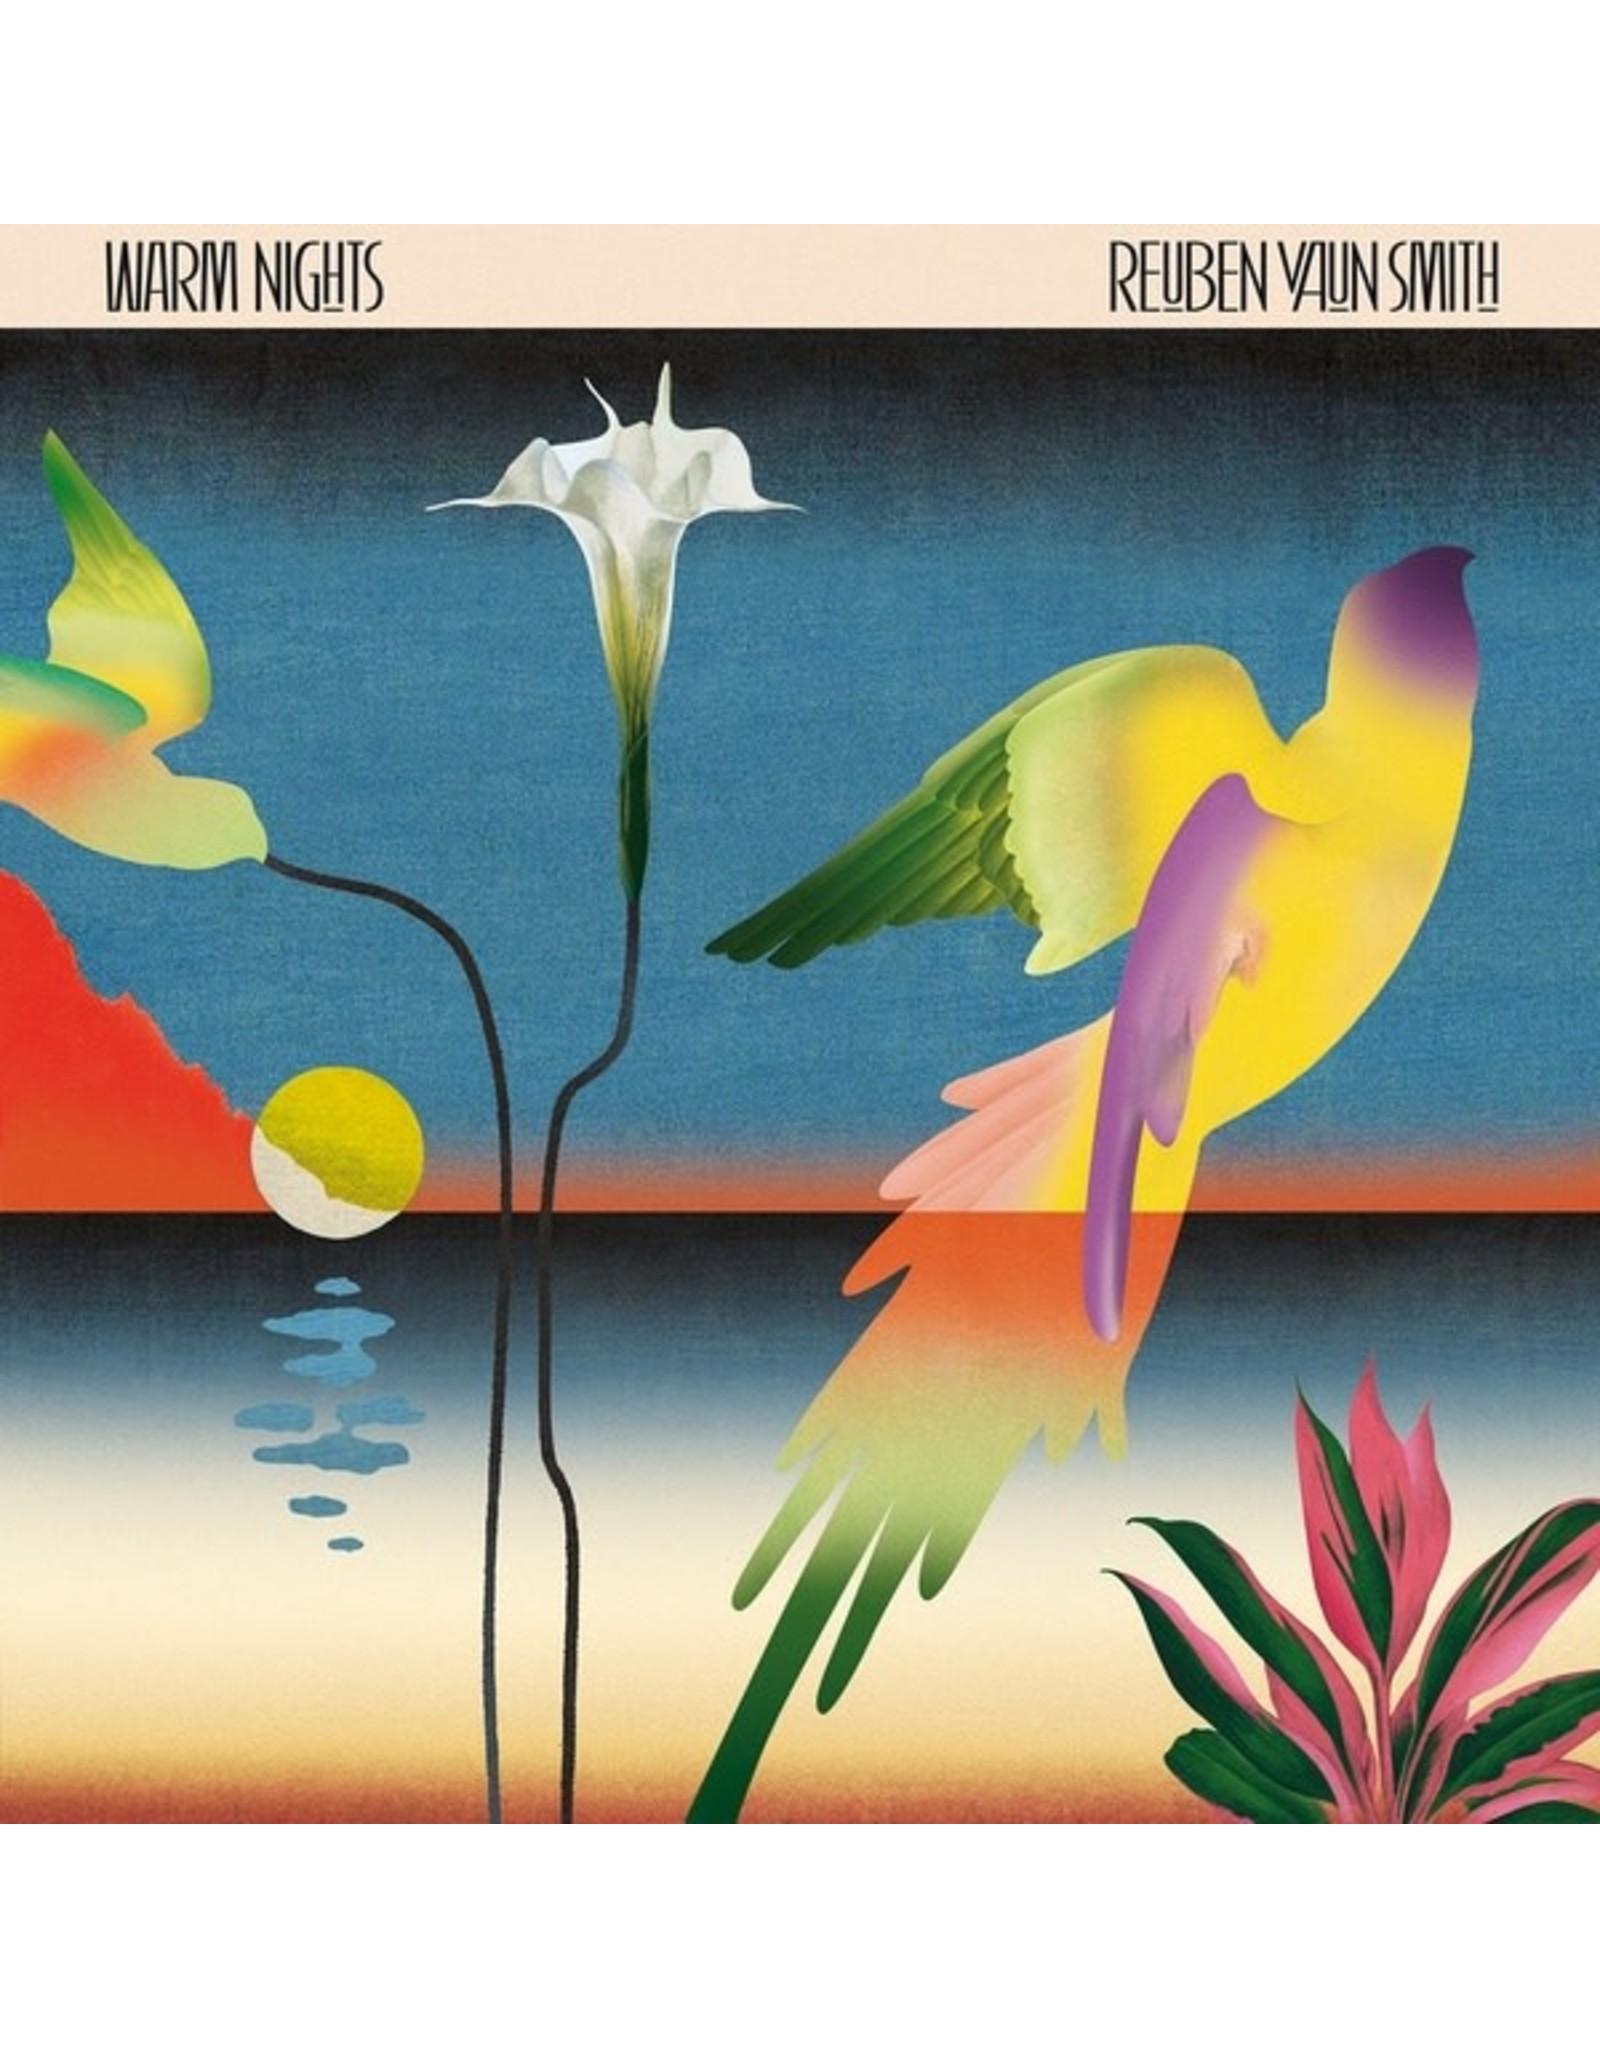 New Vinyl Reuben Vaun Smith - Warm Nights LP